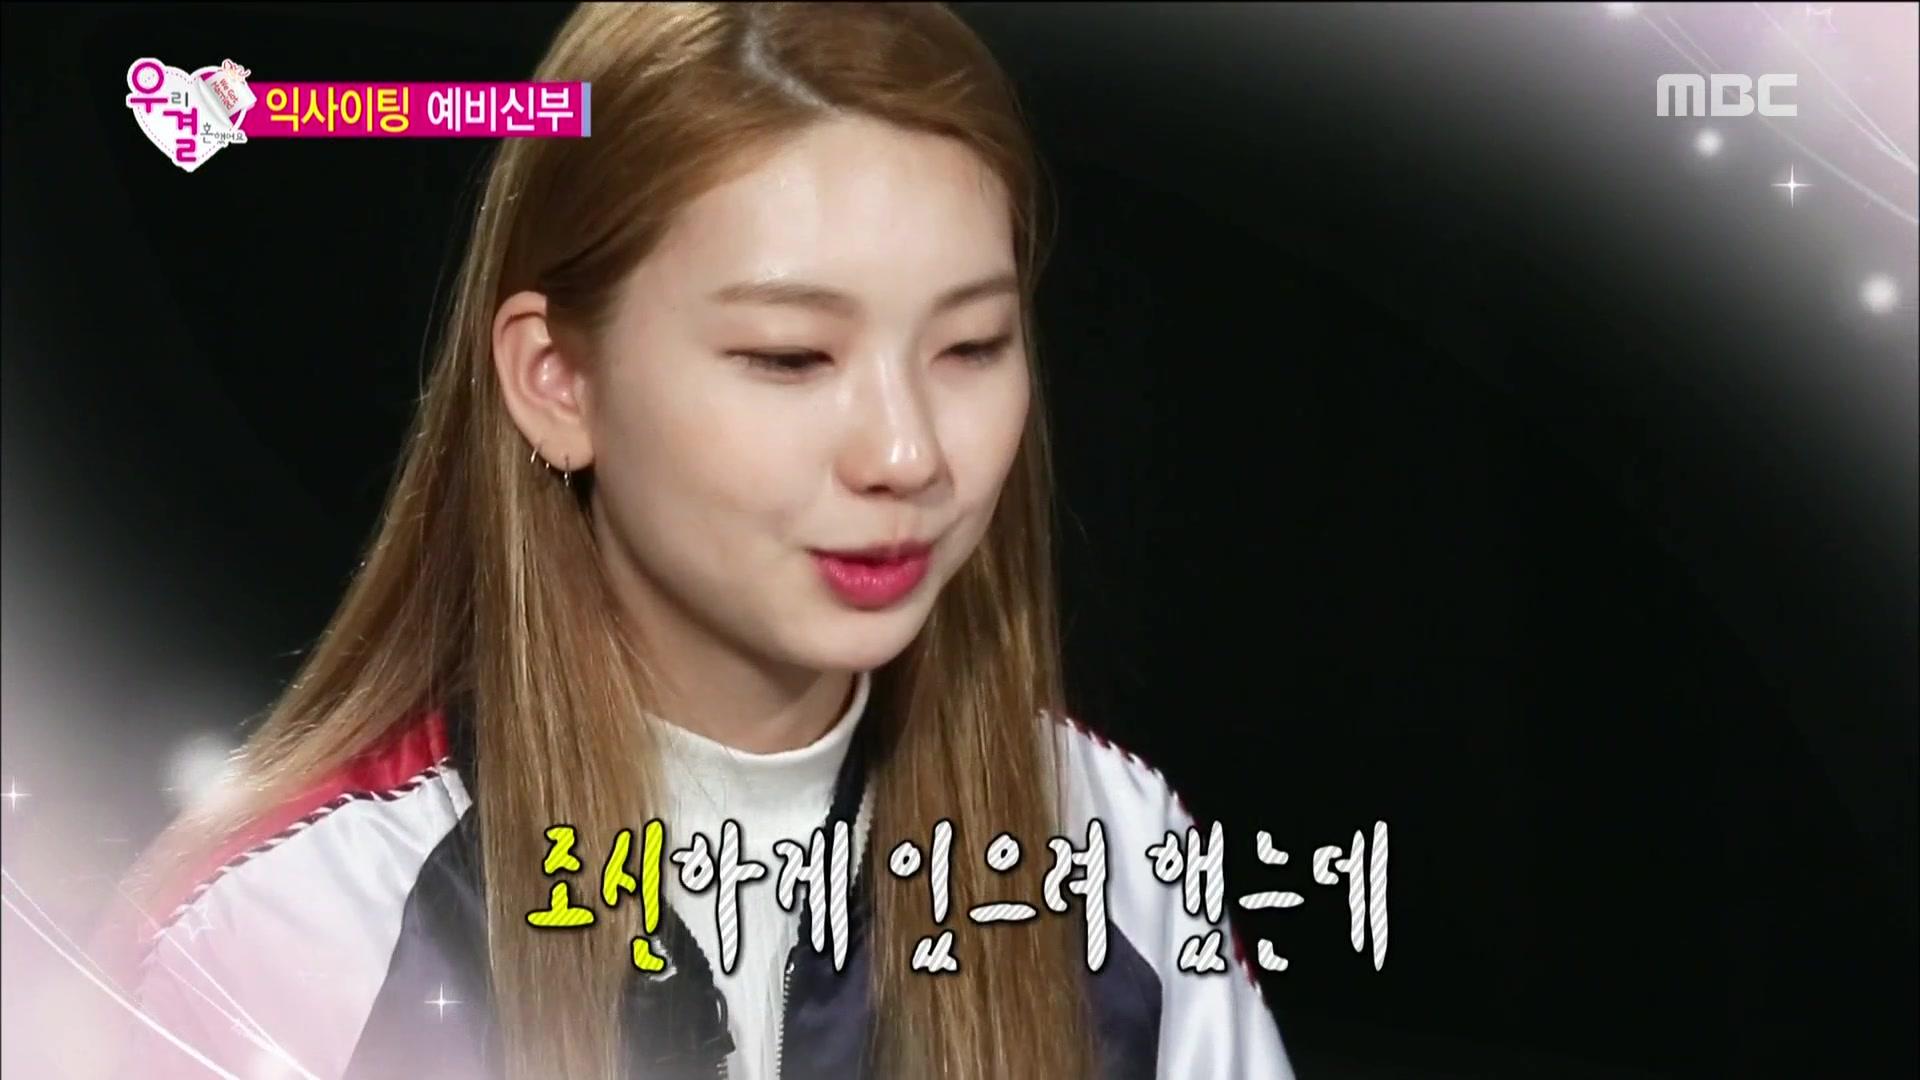 We Got Married Jota Jin Kyung Ep 1 Sub Espaol ✓ The